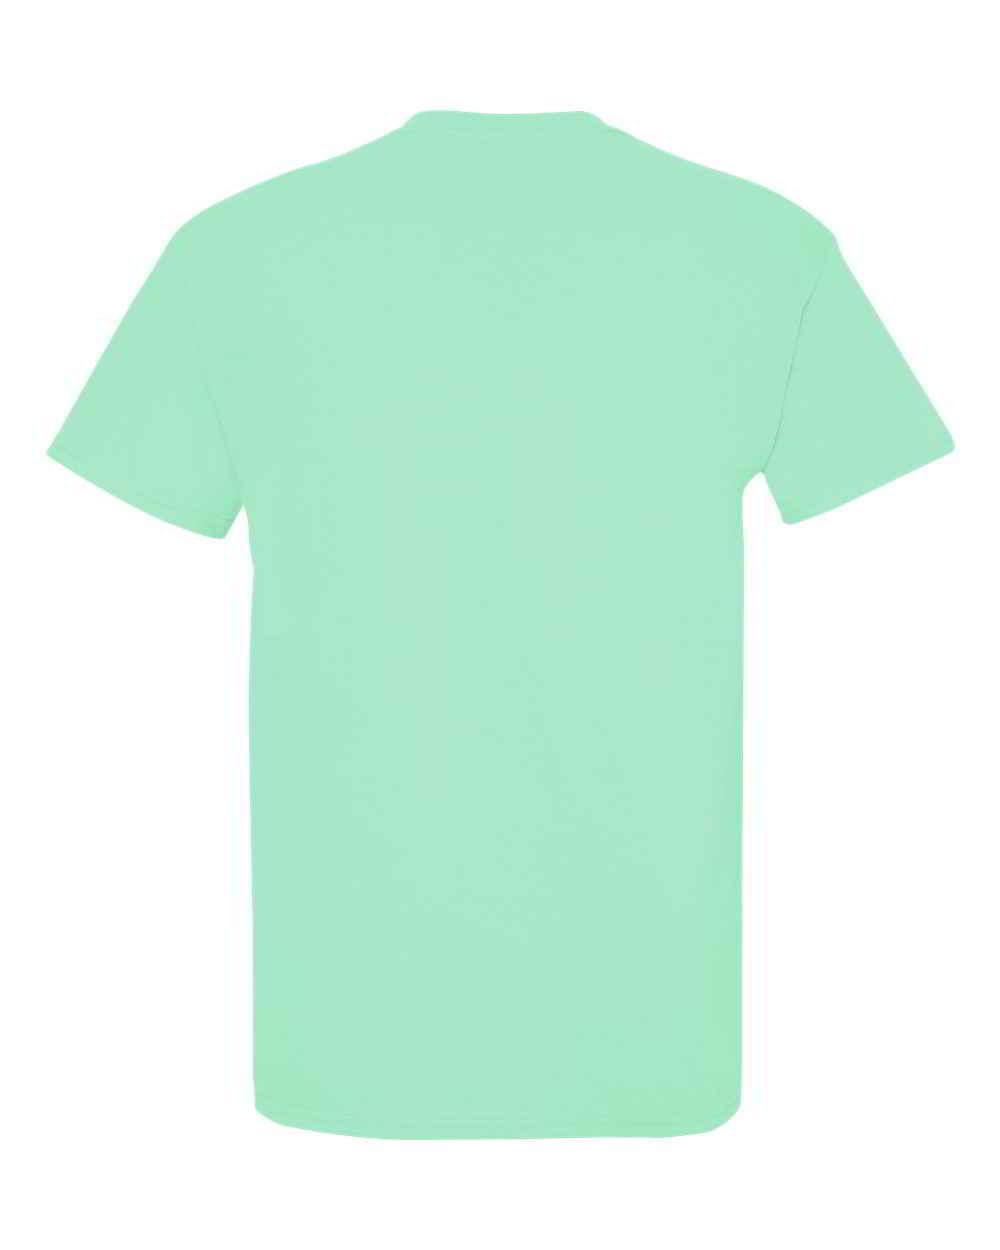 Gildan-Heavy-Cotton-Short-Sleeve-Mens-Green-T-Shirts-5000 thumbnail 26